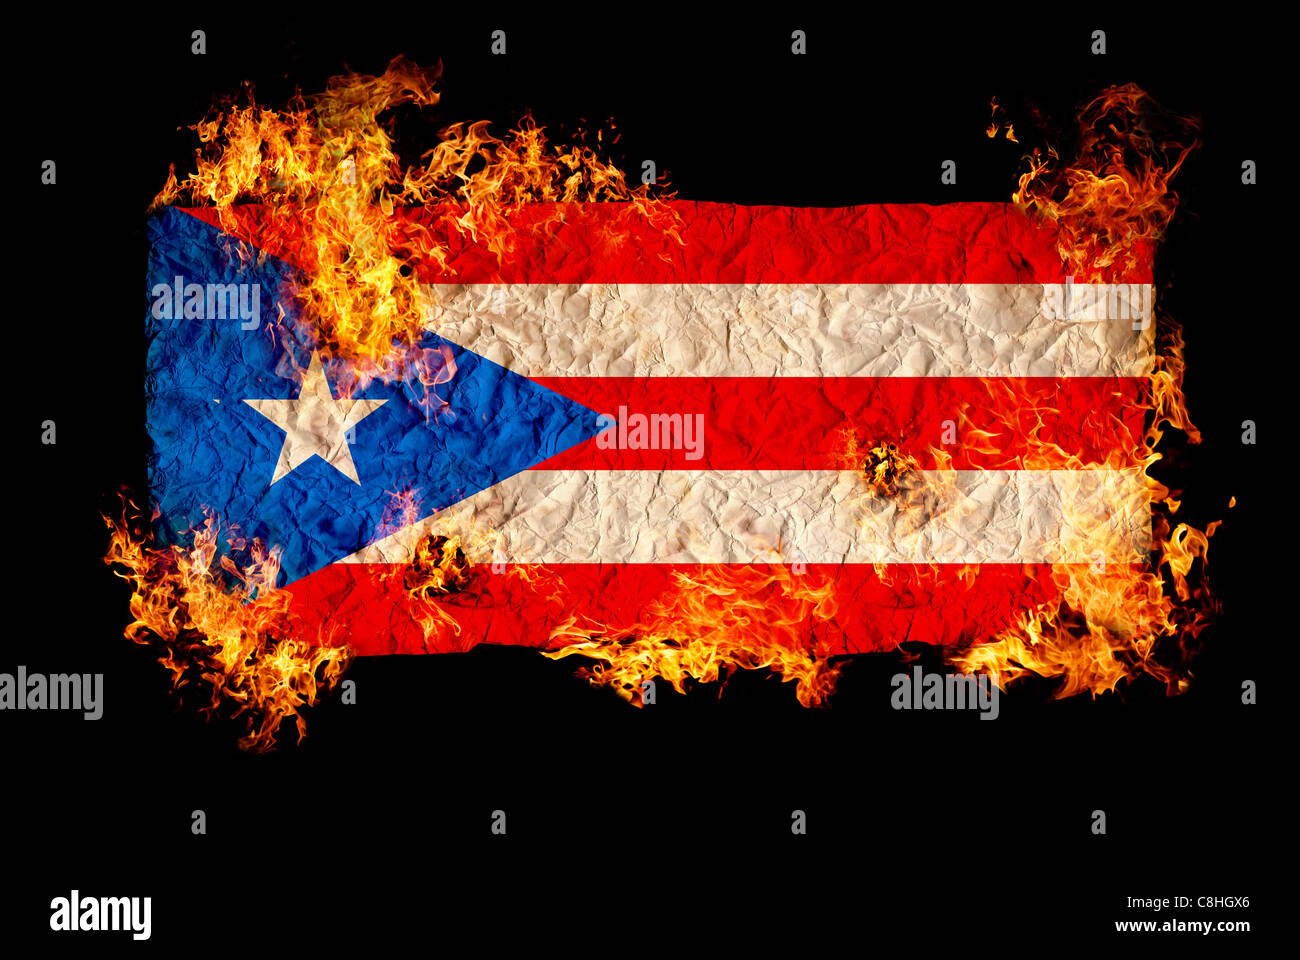 National Symbols And Flag Of Puerto Rico Stock Photo 39724446 Alamy